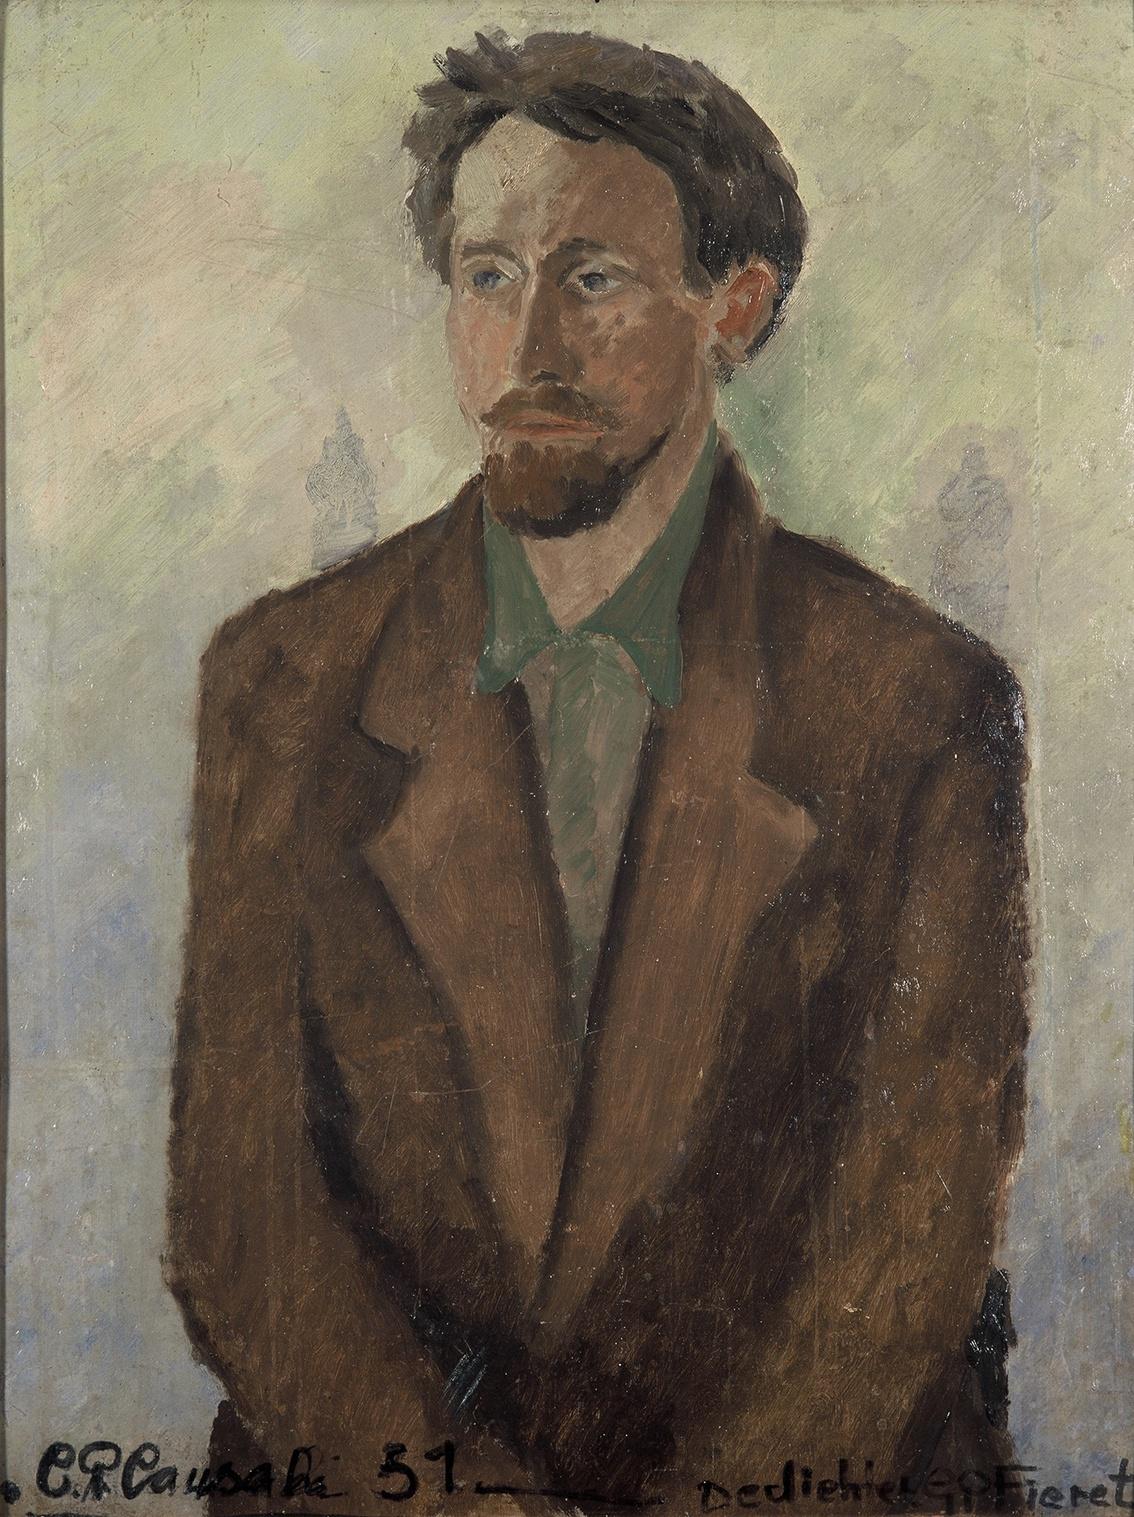 De dichter Gerard Fieret (C.P. Causali, 1951 - Collectie Literatuurmuseum Den Haag)